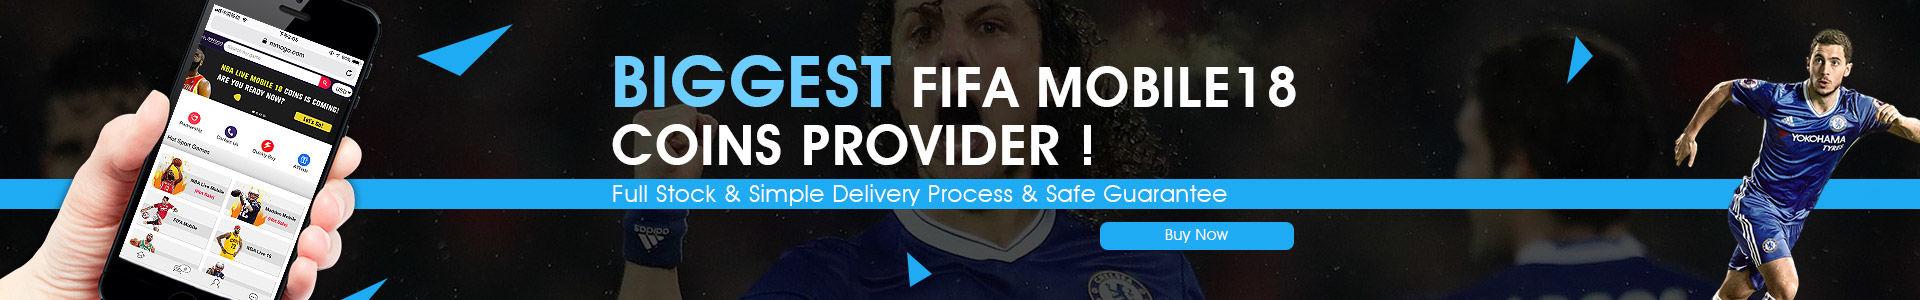 Biggest FIFA Mobile